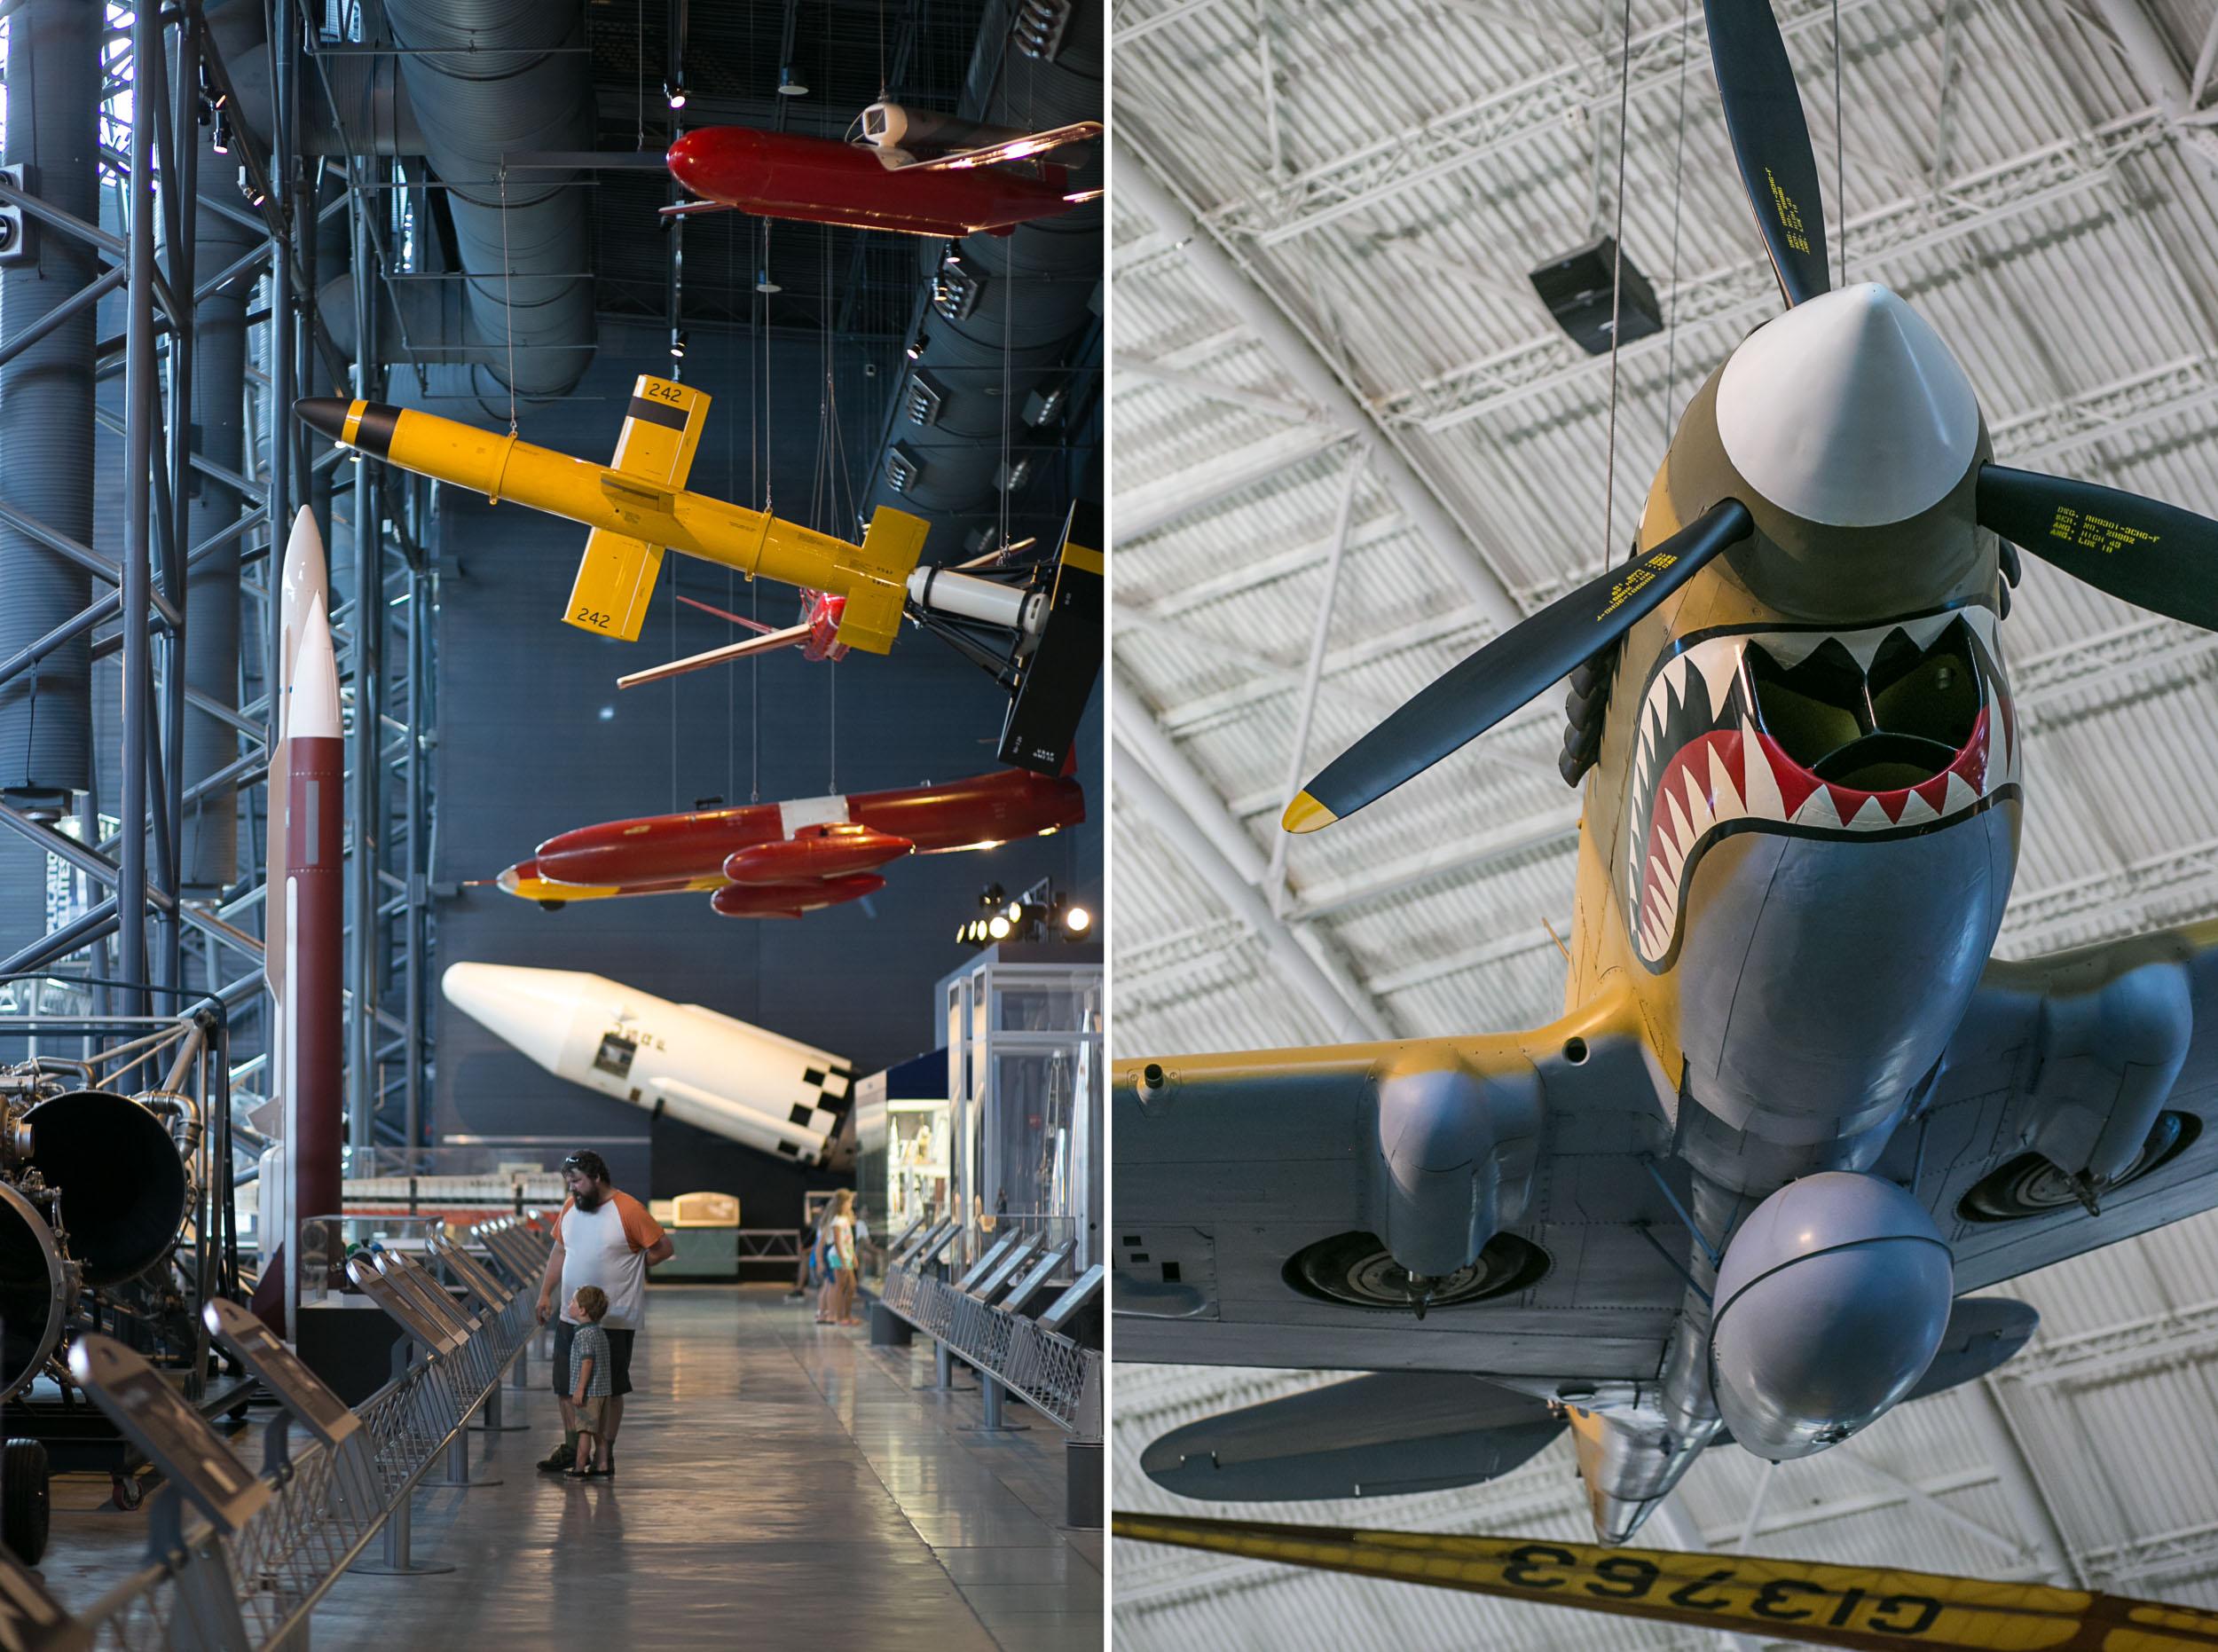 plane with teeth